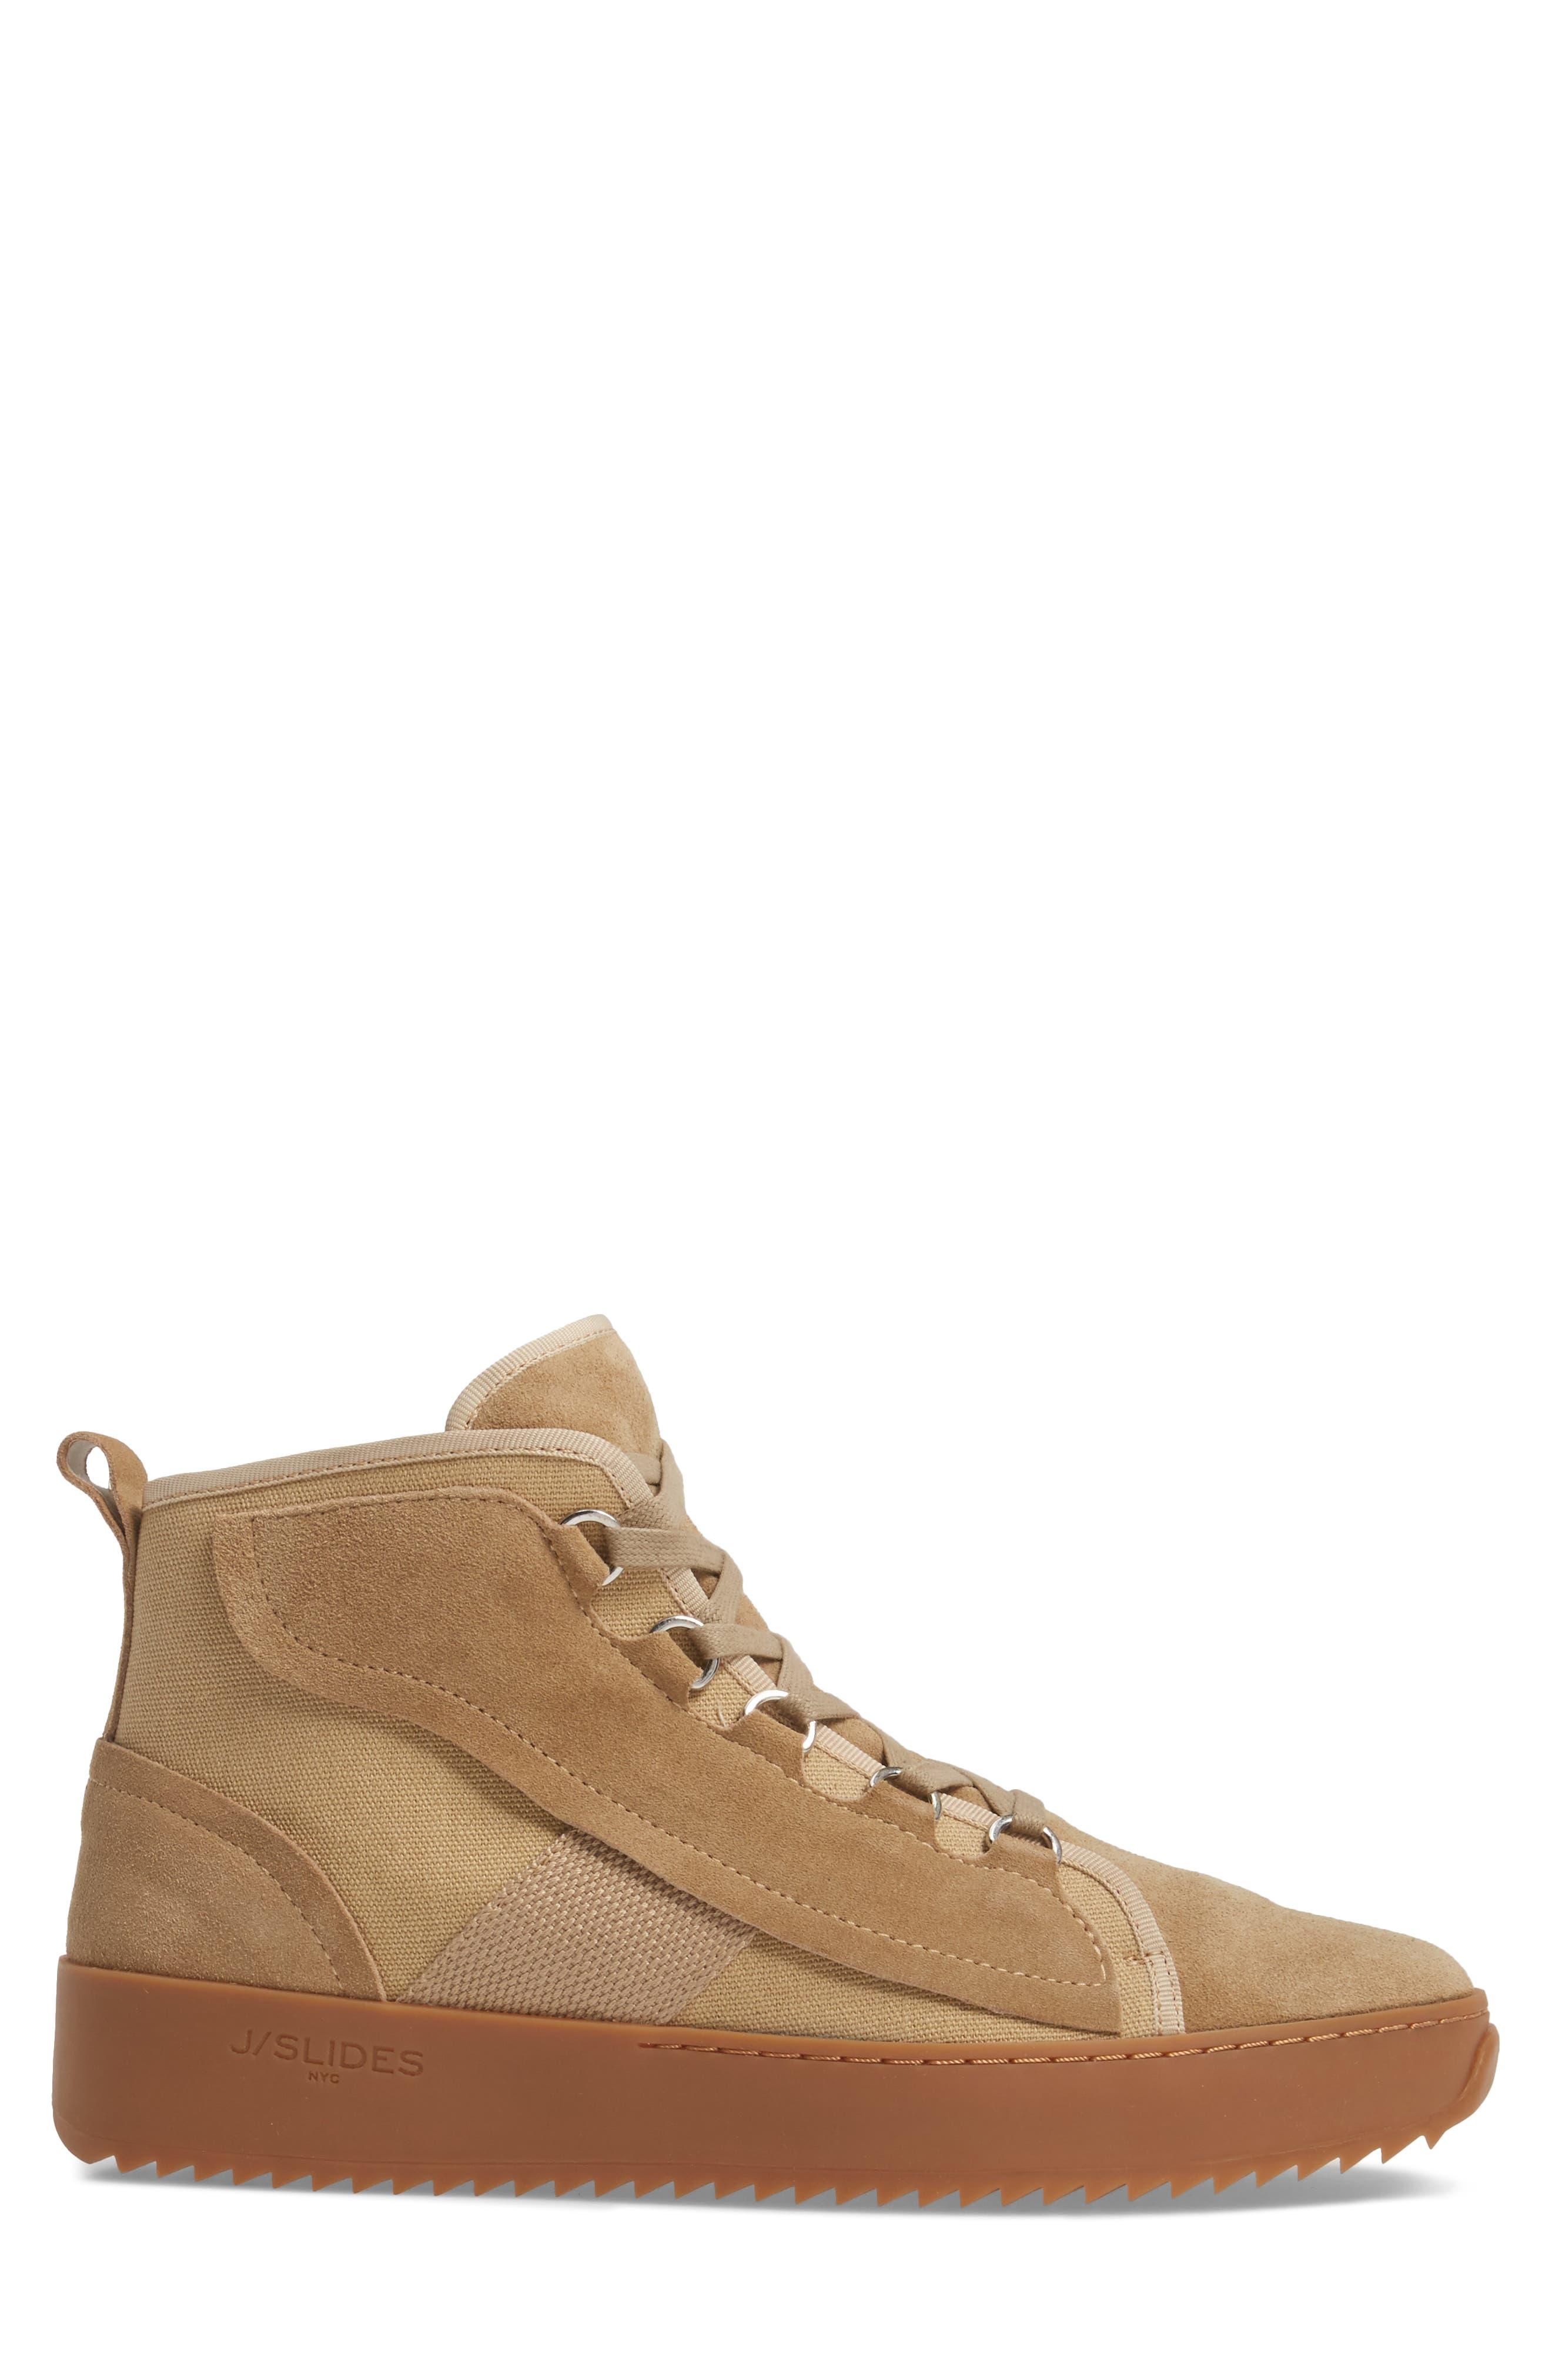 Sander Sneaker,                             Alternate thumbnail 3, color,                             Sand Suede